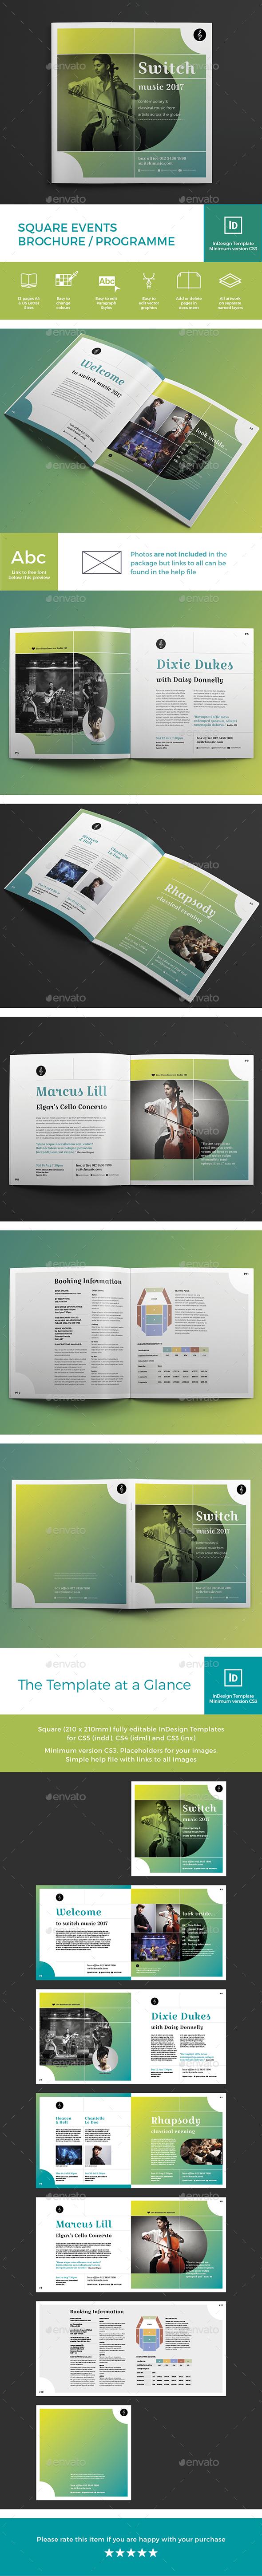 Square Events Brochure / Programme - Brochures Print Templates